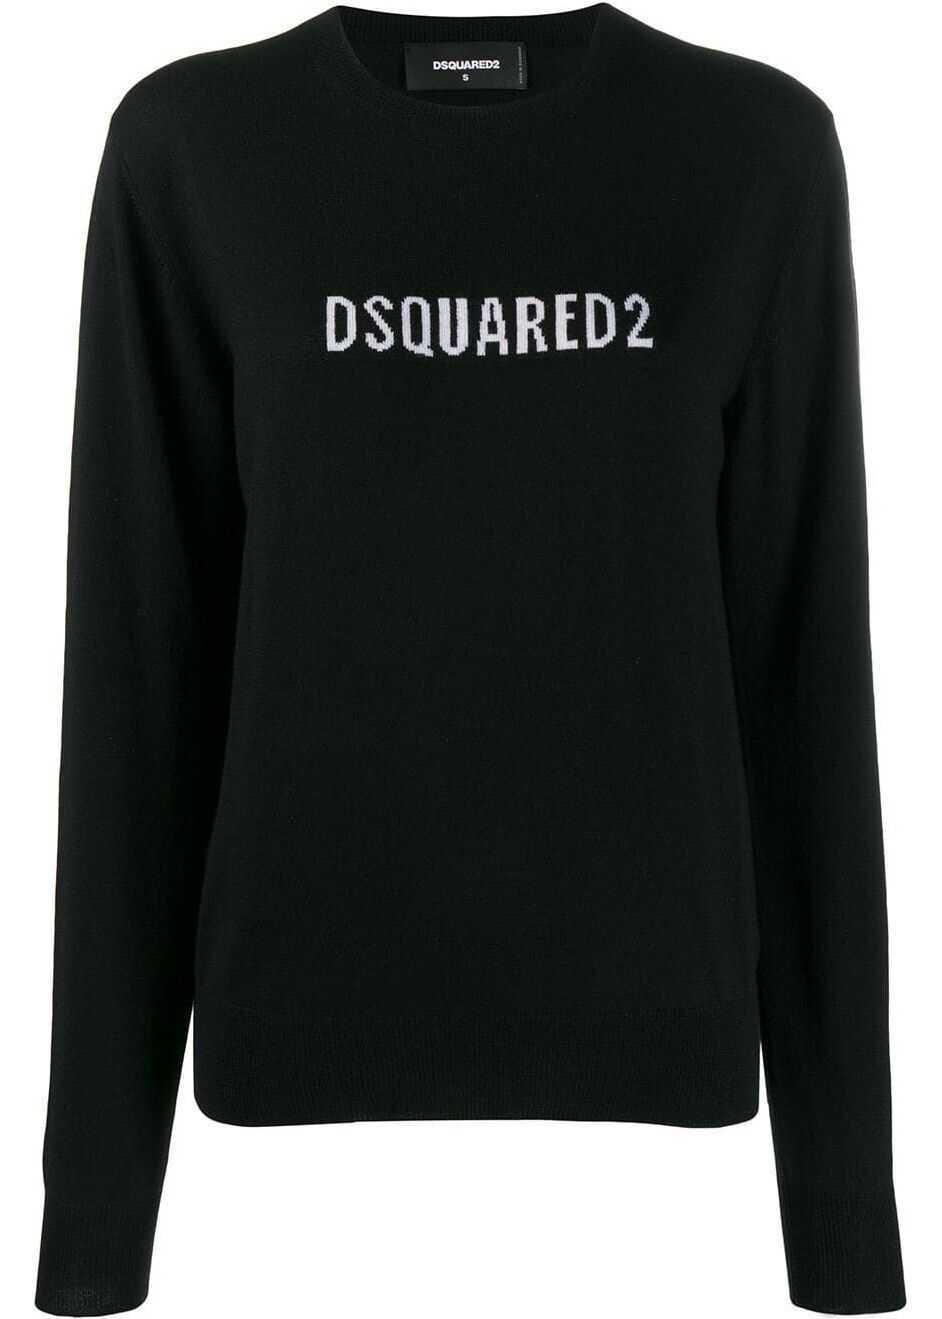 DSQUARED2 Wool Sweater BLACK